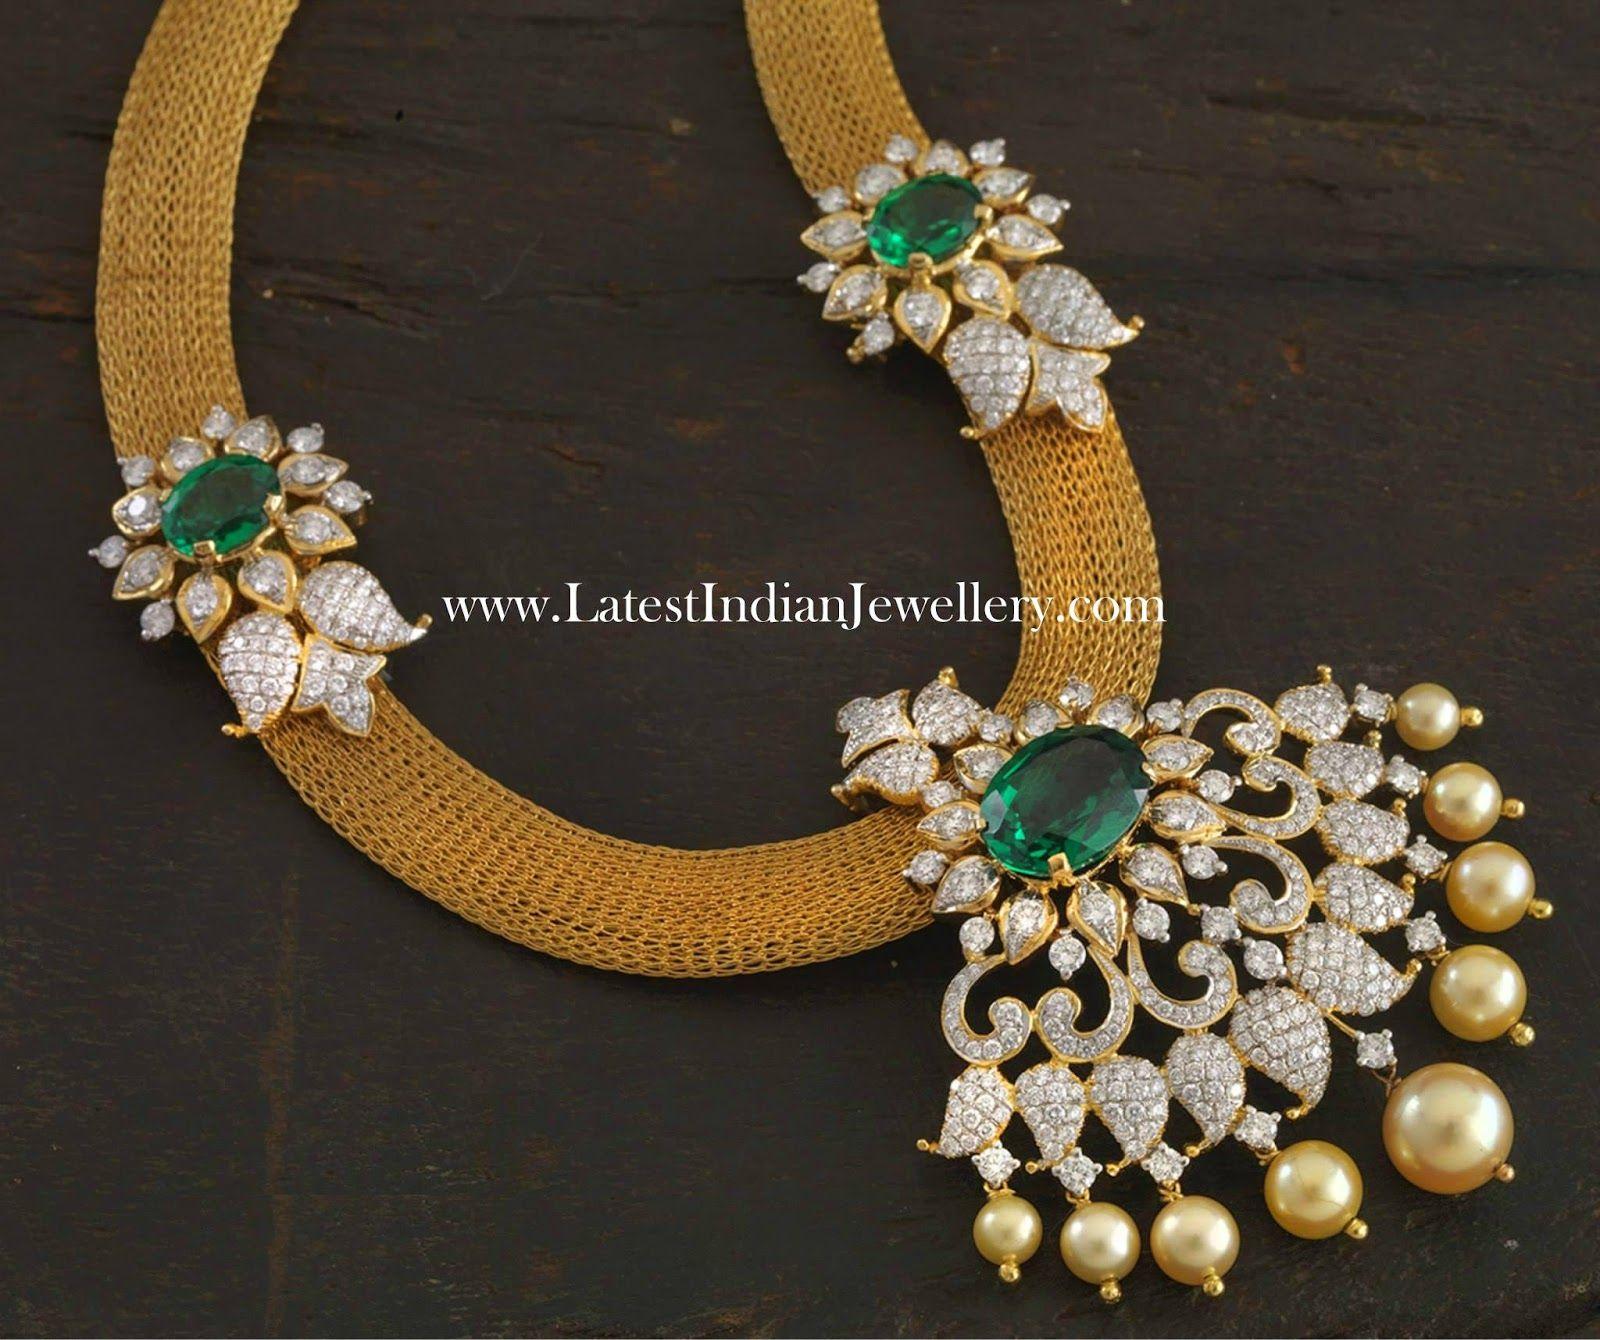 Emerald Diamond Jewellery: Diamond Emerald Pendant With Mesh Chain